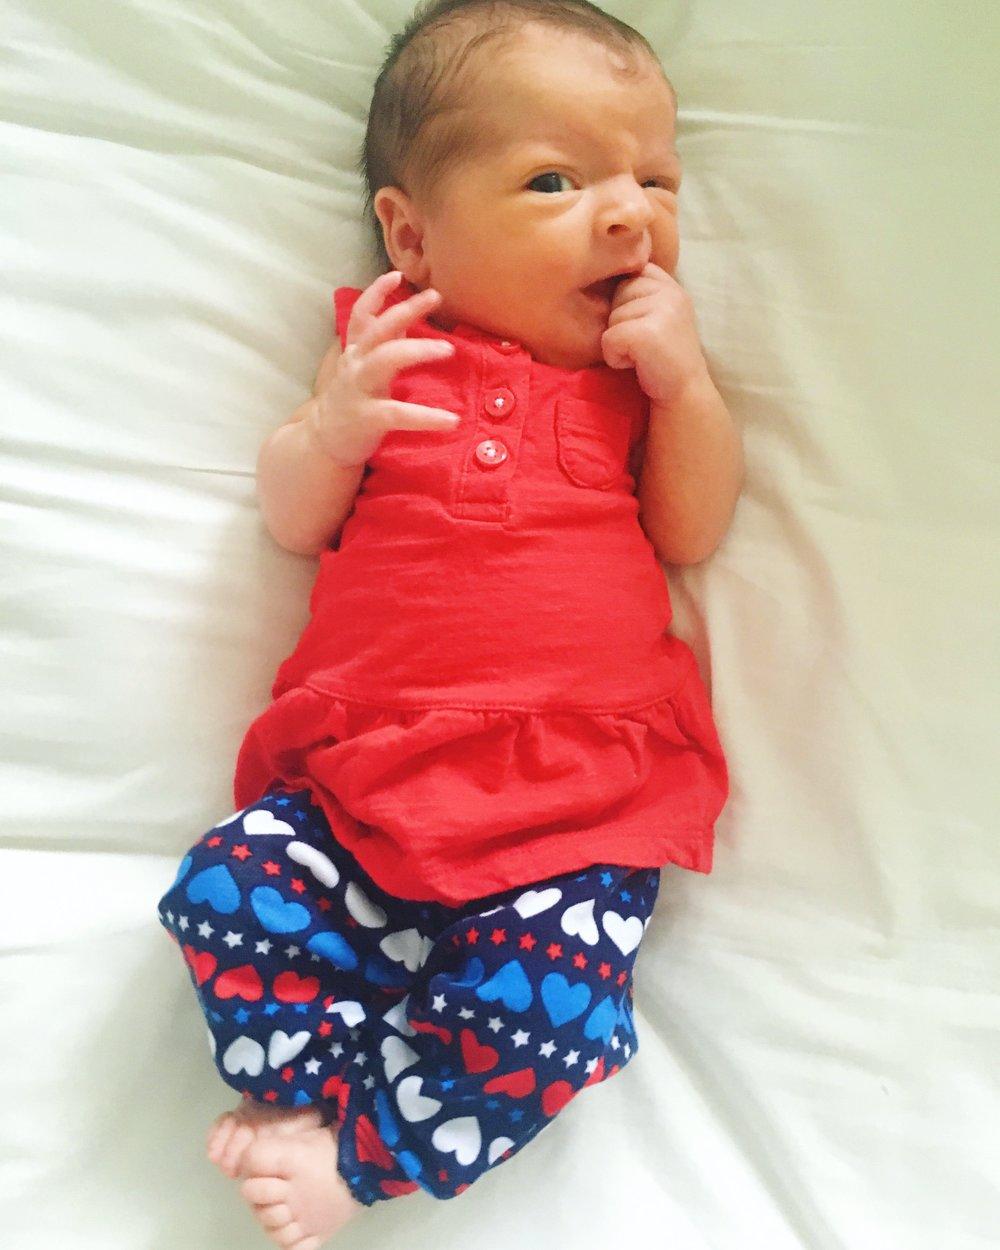 My daughter Ellie, at three days old.